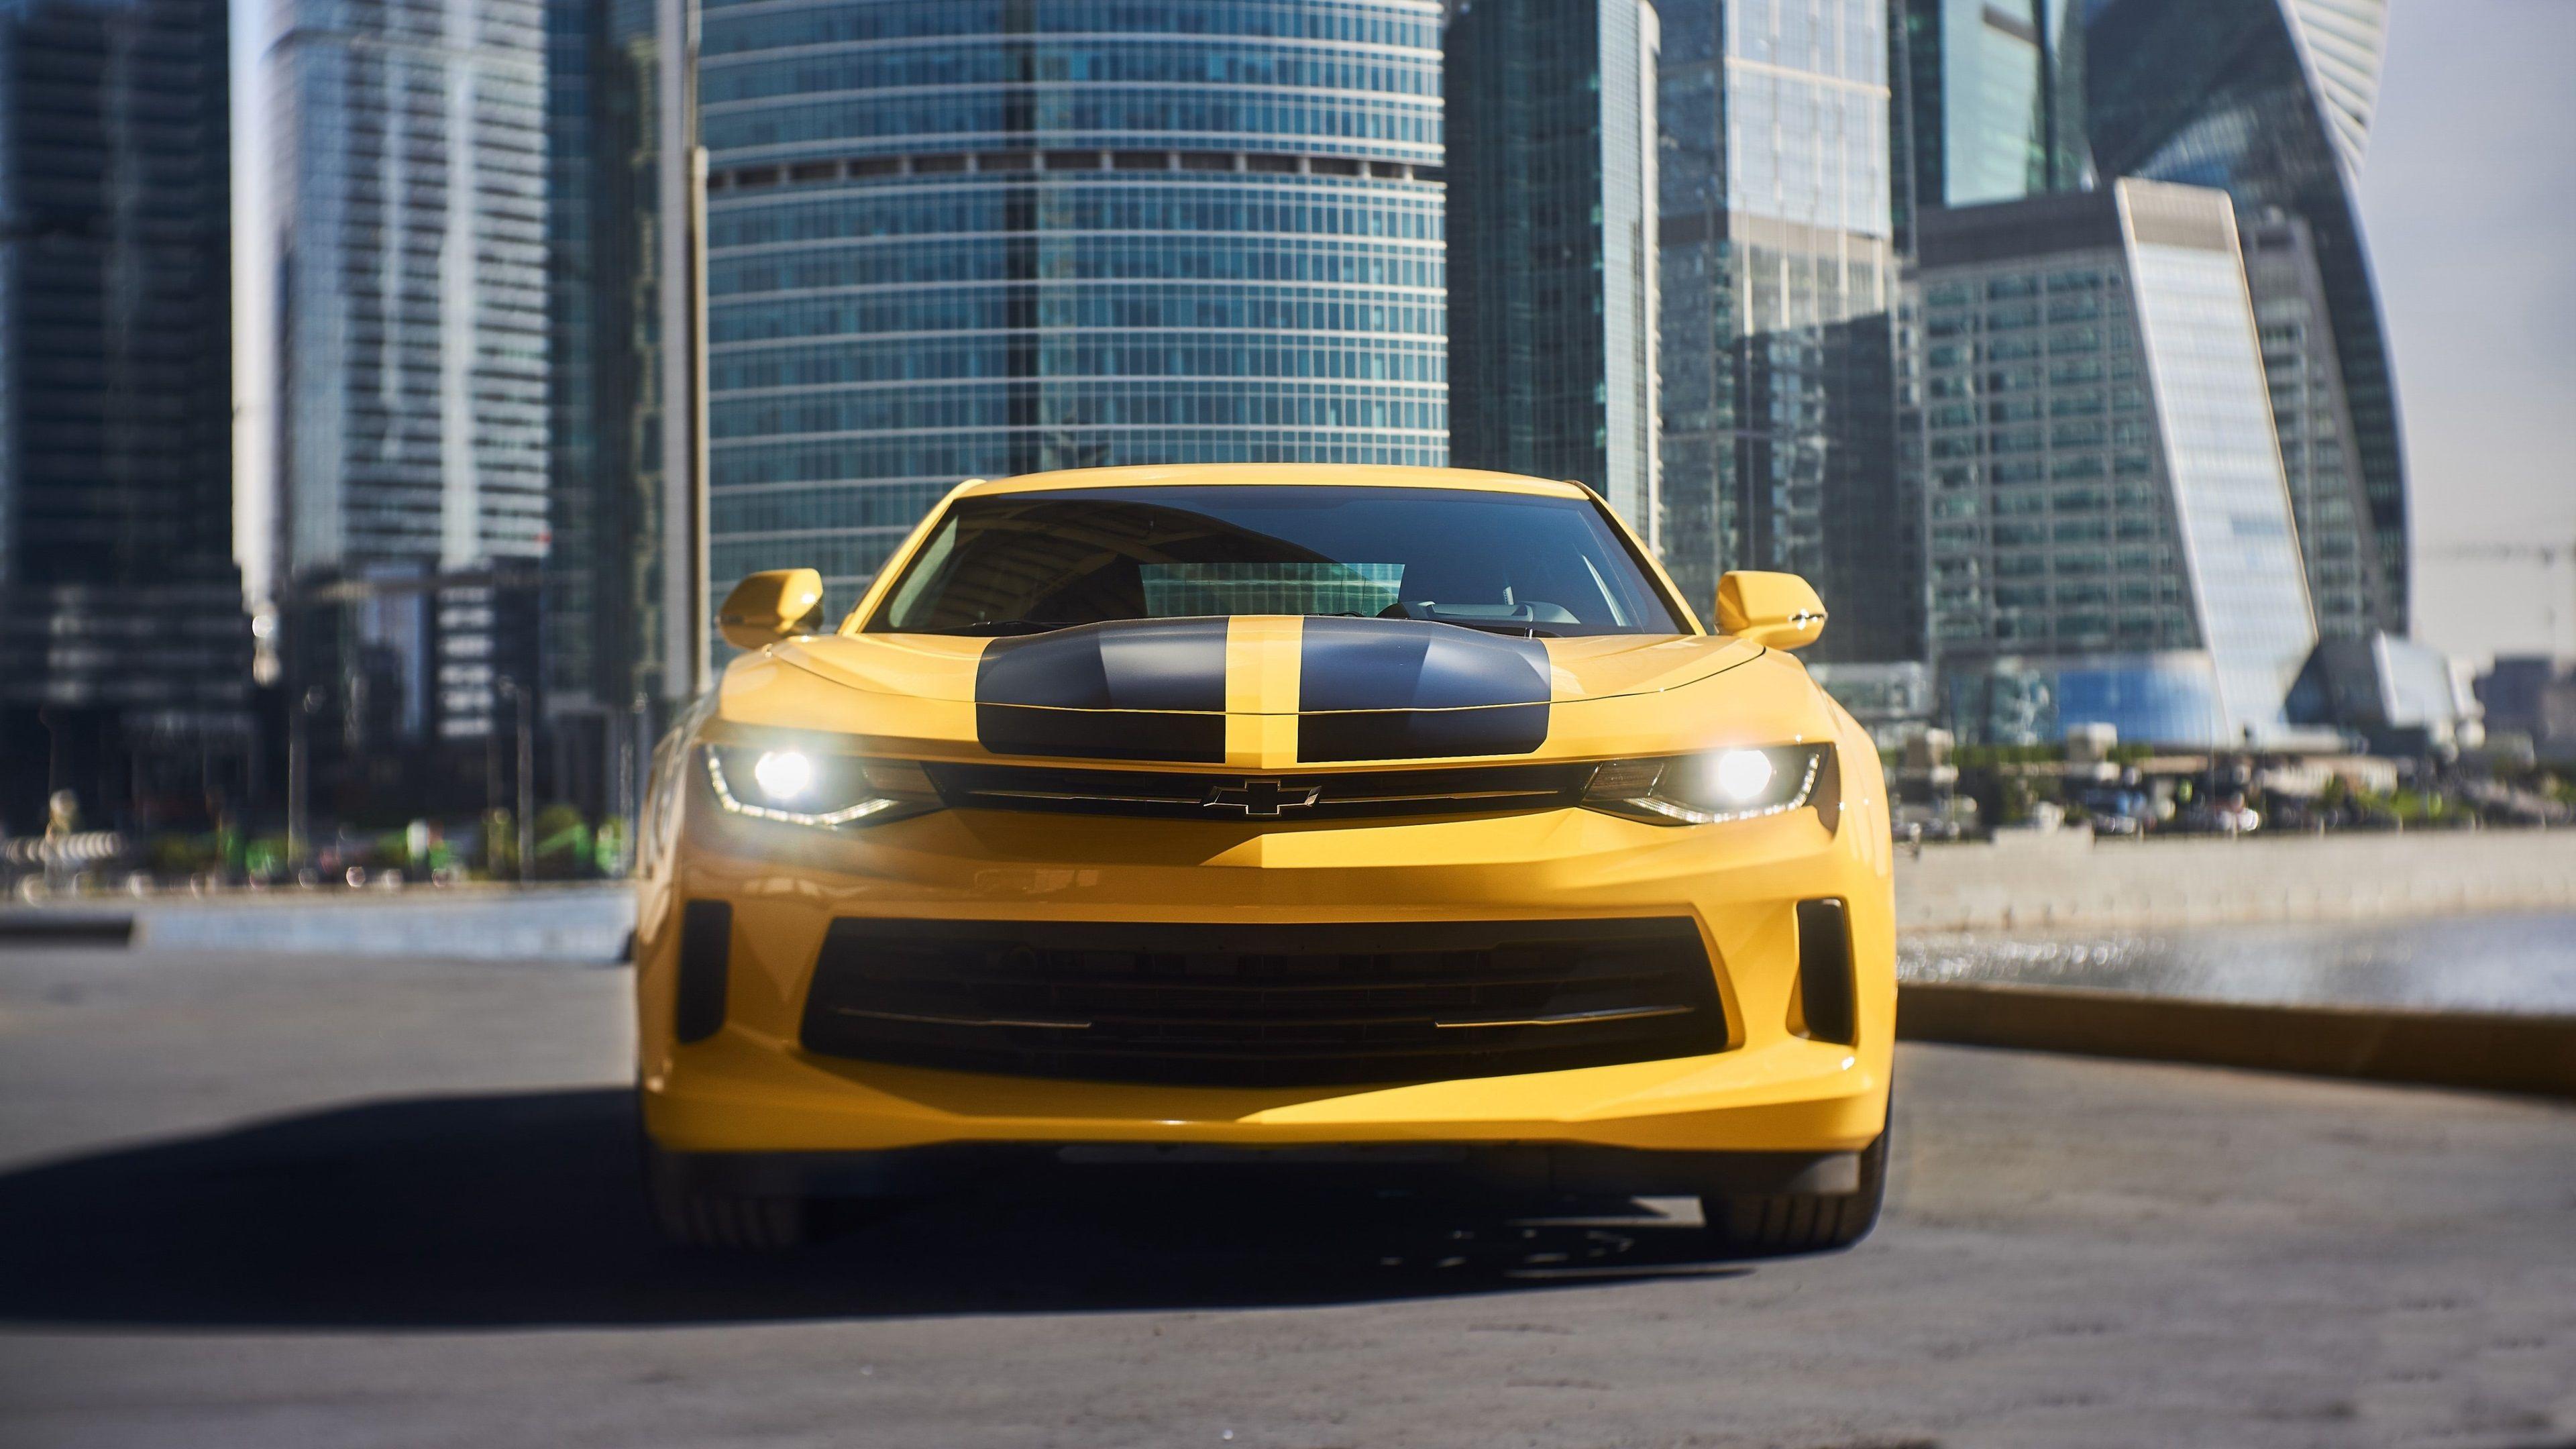 3840x2160 Chevrolet Camaro Performance 4k Hd Wallpaper Amazing